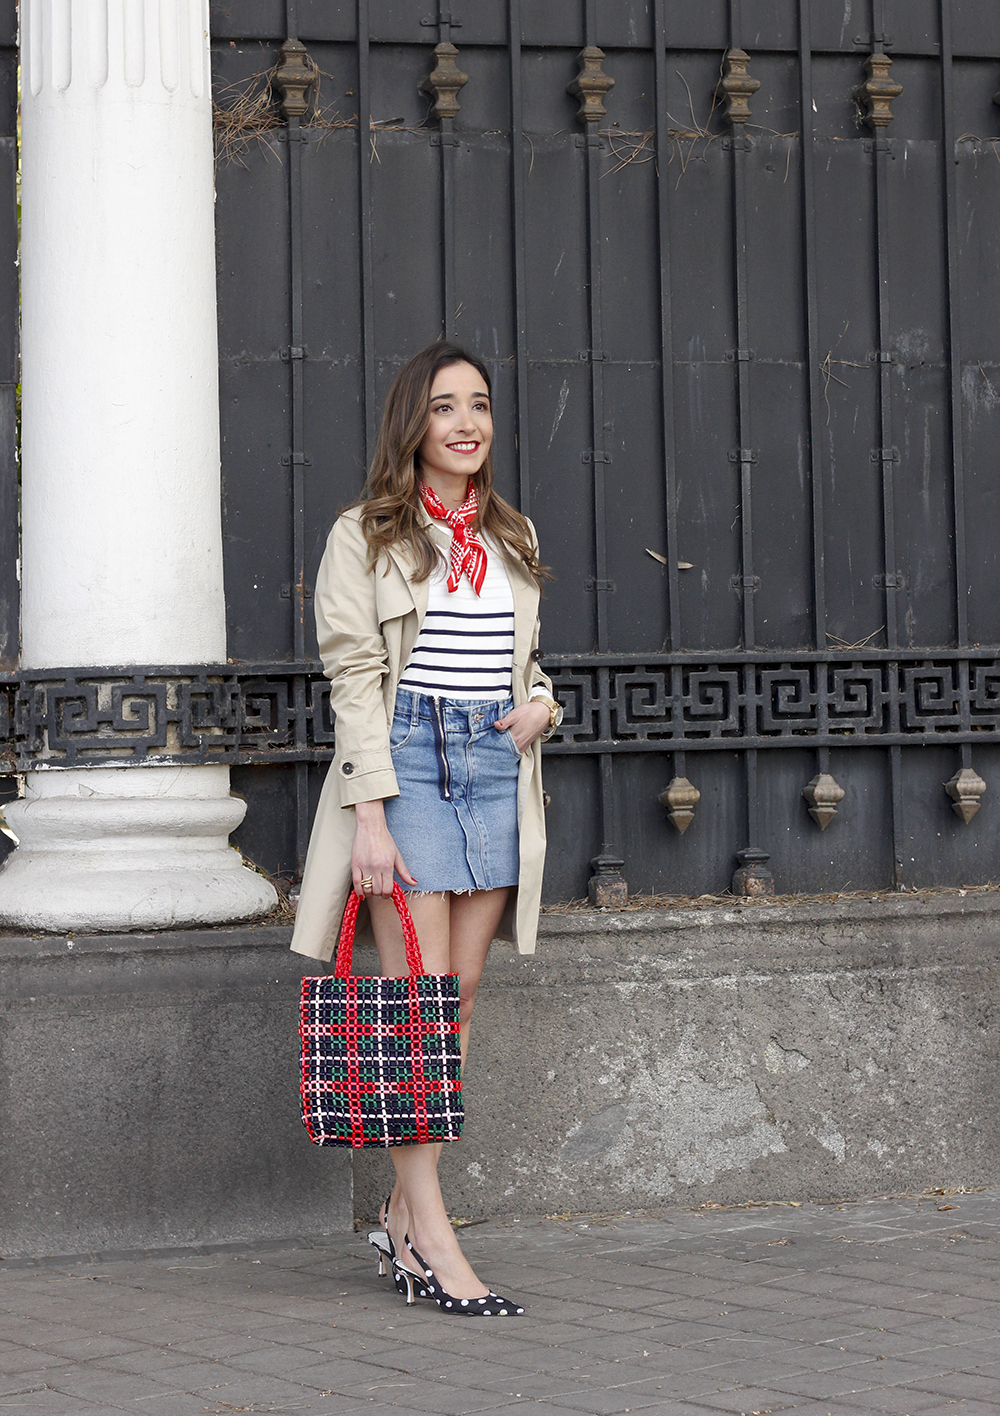 trench outfit denim skirt kitten heels striped sweater spring 02